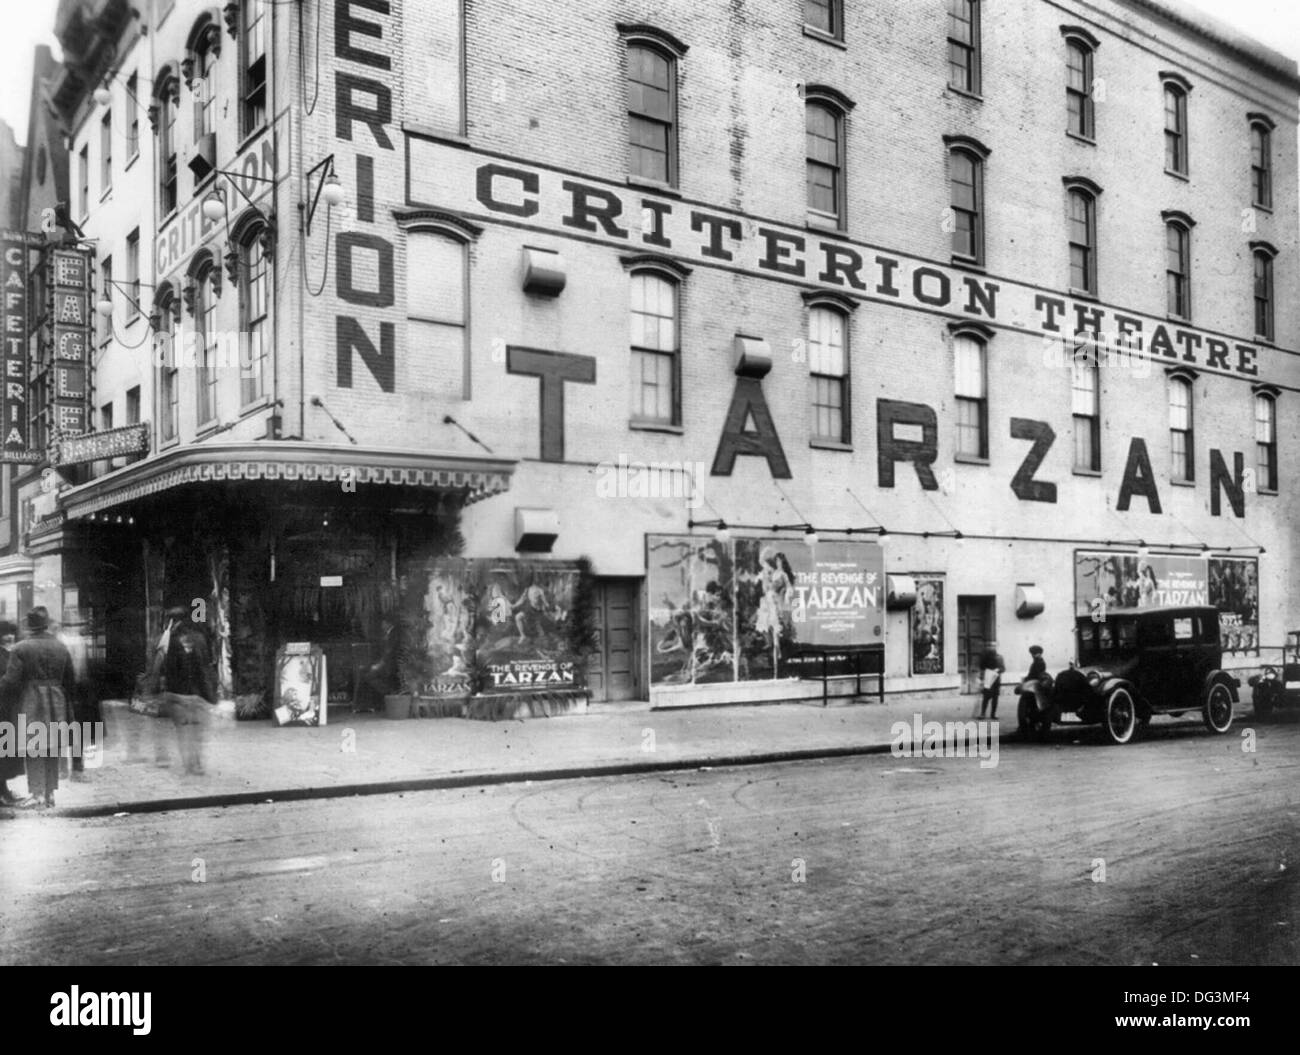 Criterion Theater, Washington, D.C.; showing 'The Revenge of Tarzan', circa 1920 - Stock Image